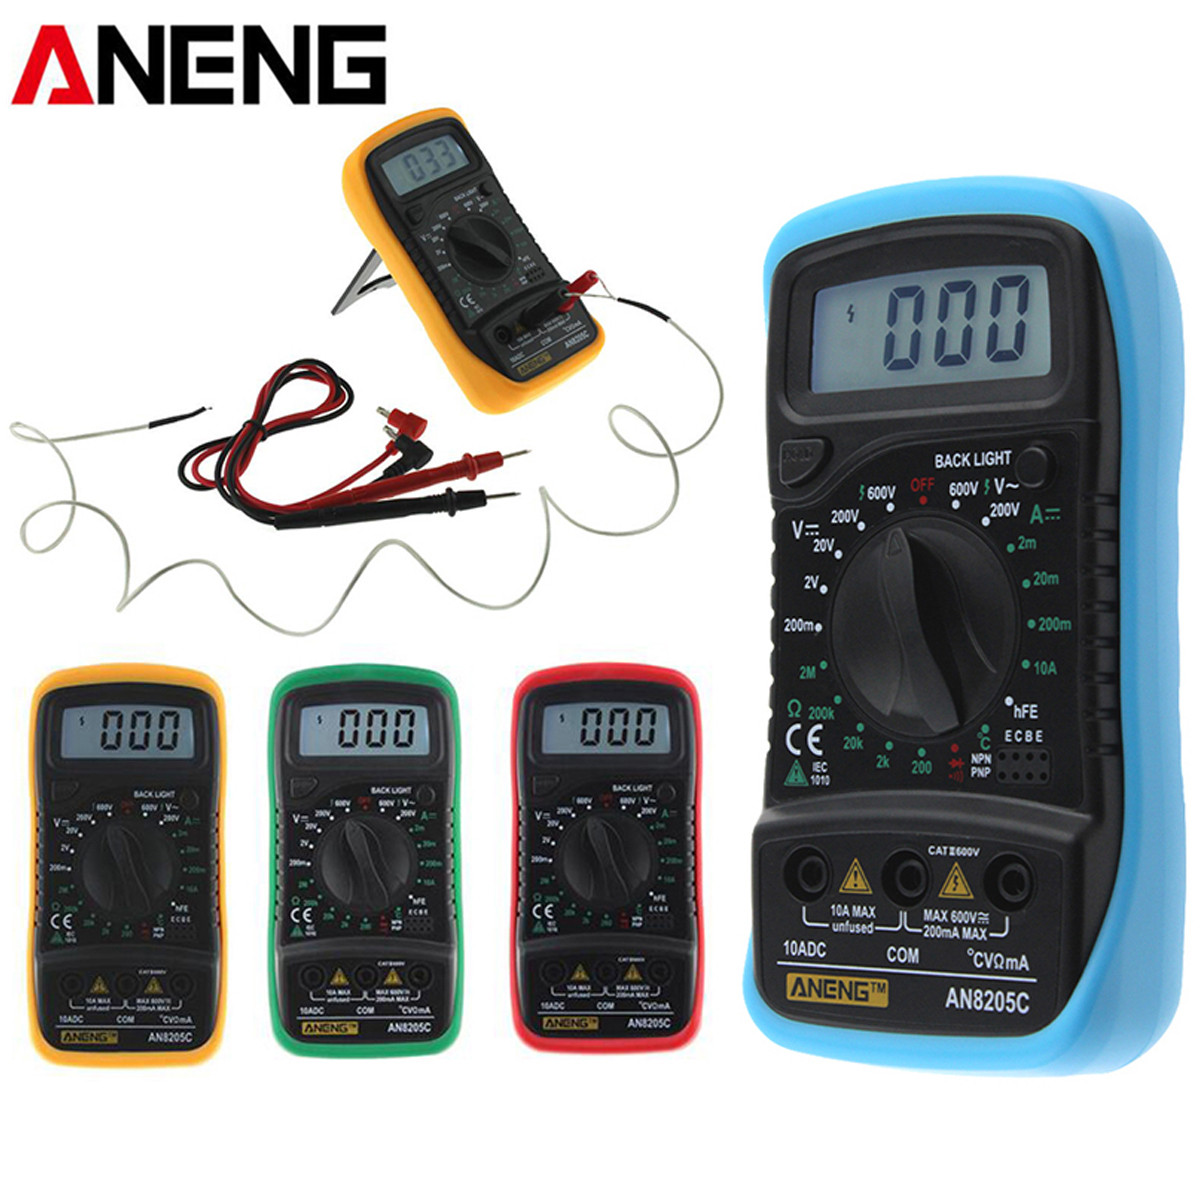 ANENG AN8205C Thermometry Digital Multimeter Voltmeter Ammeter AC DC OHM Volt Tester Test Temperature Gauge Tool